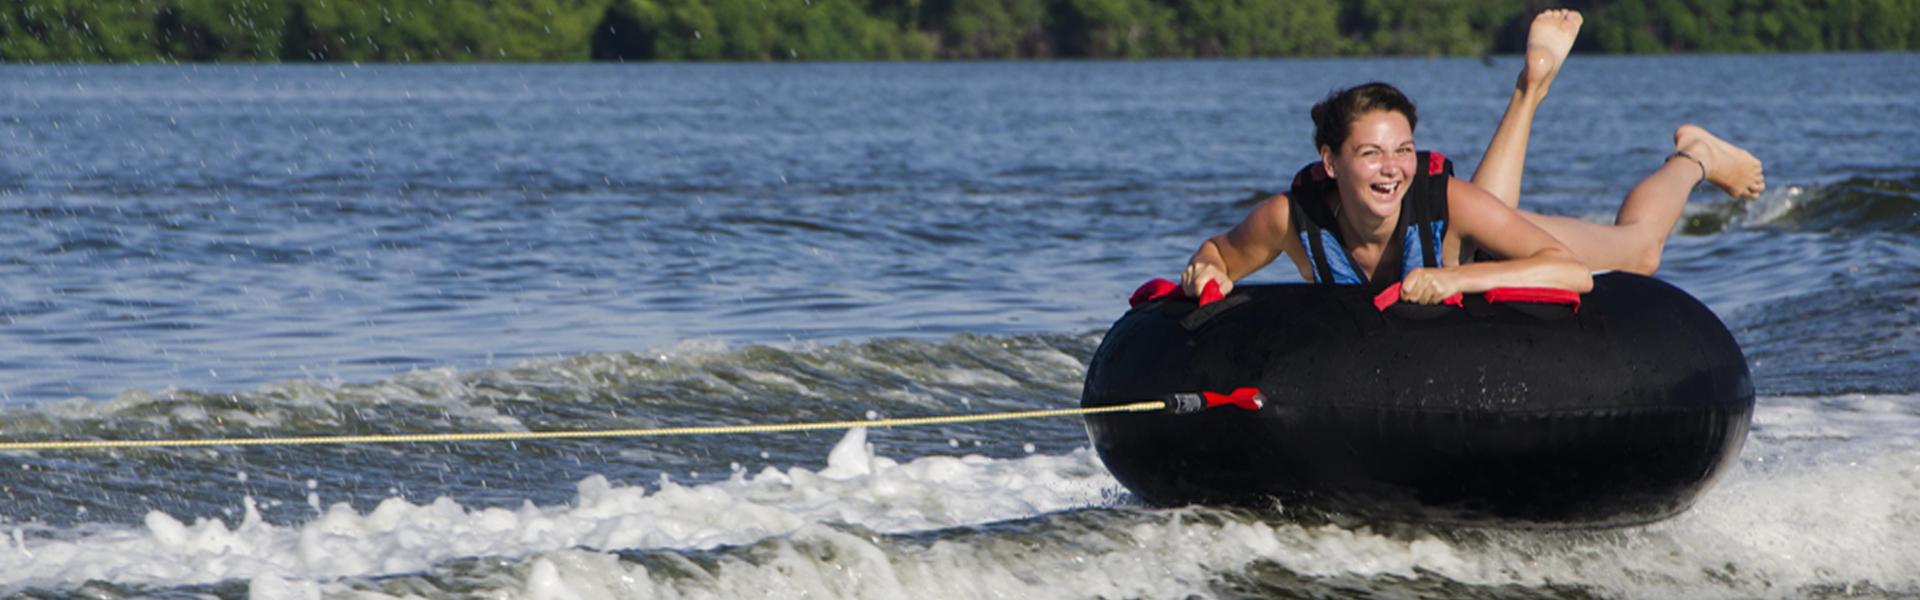 Water sports in Negombo